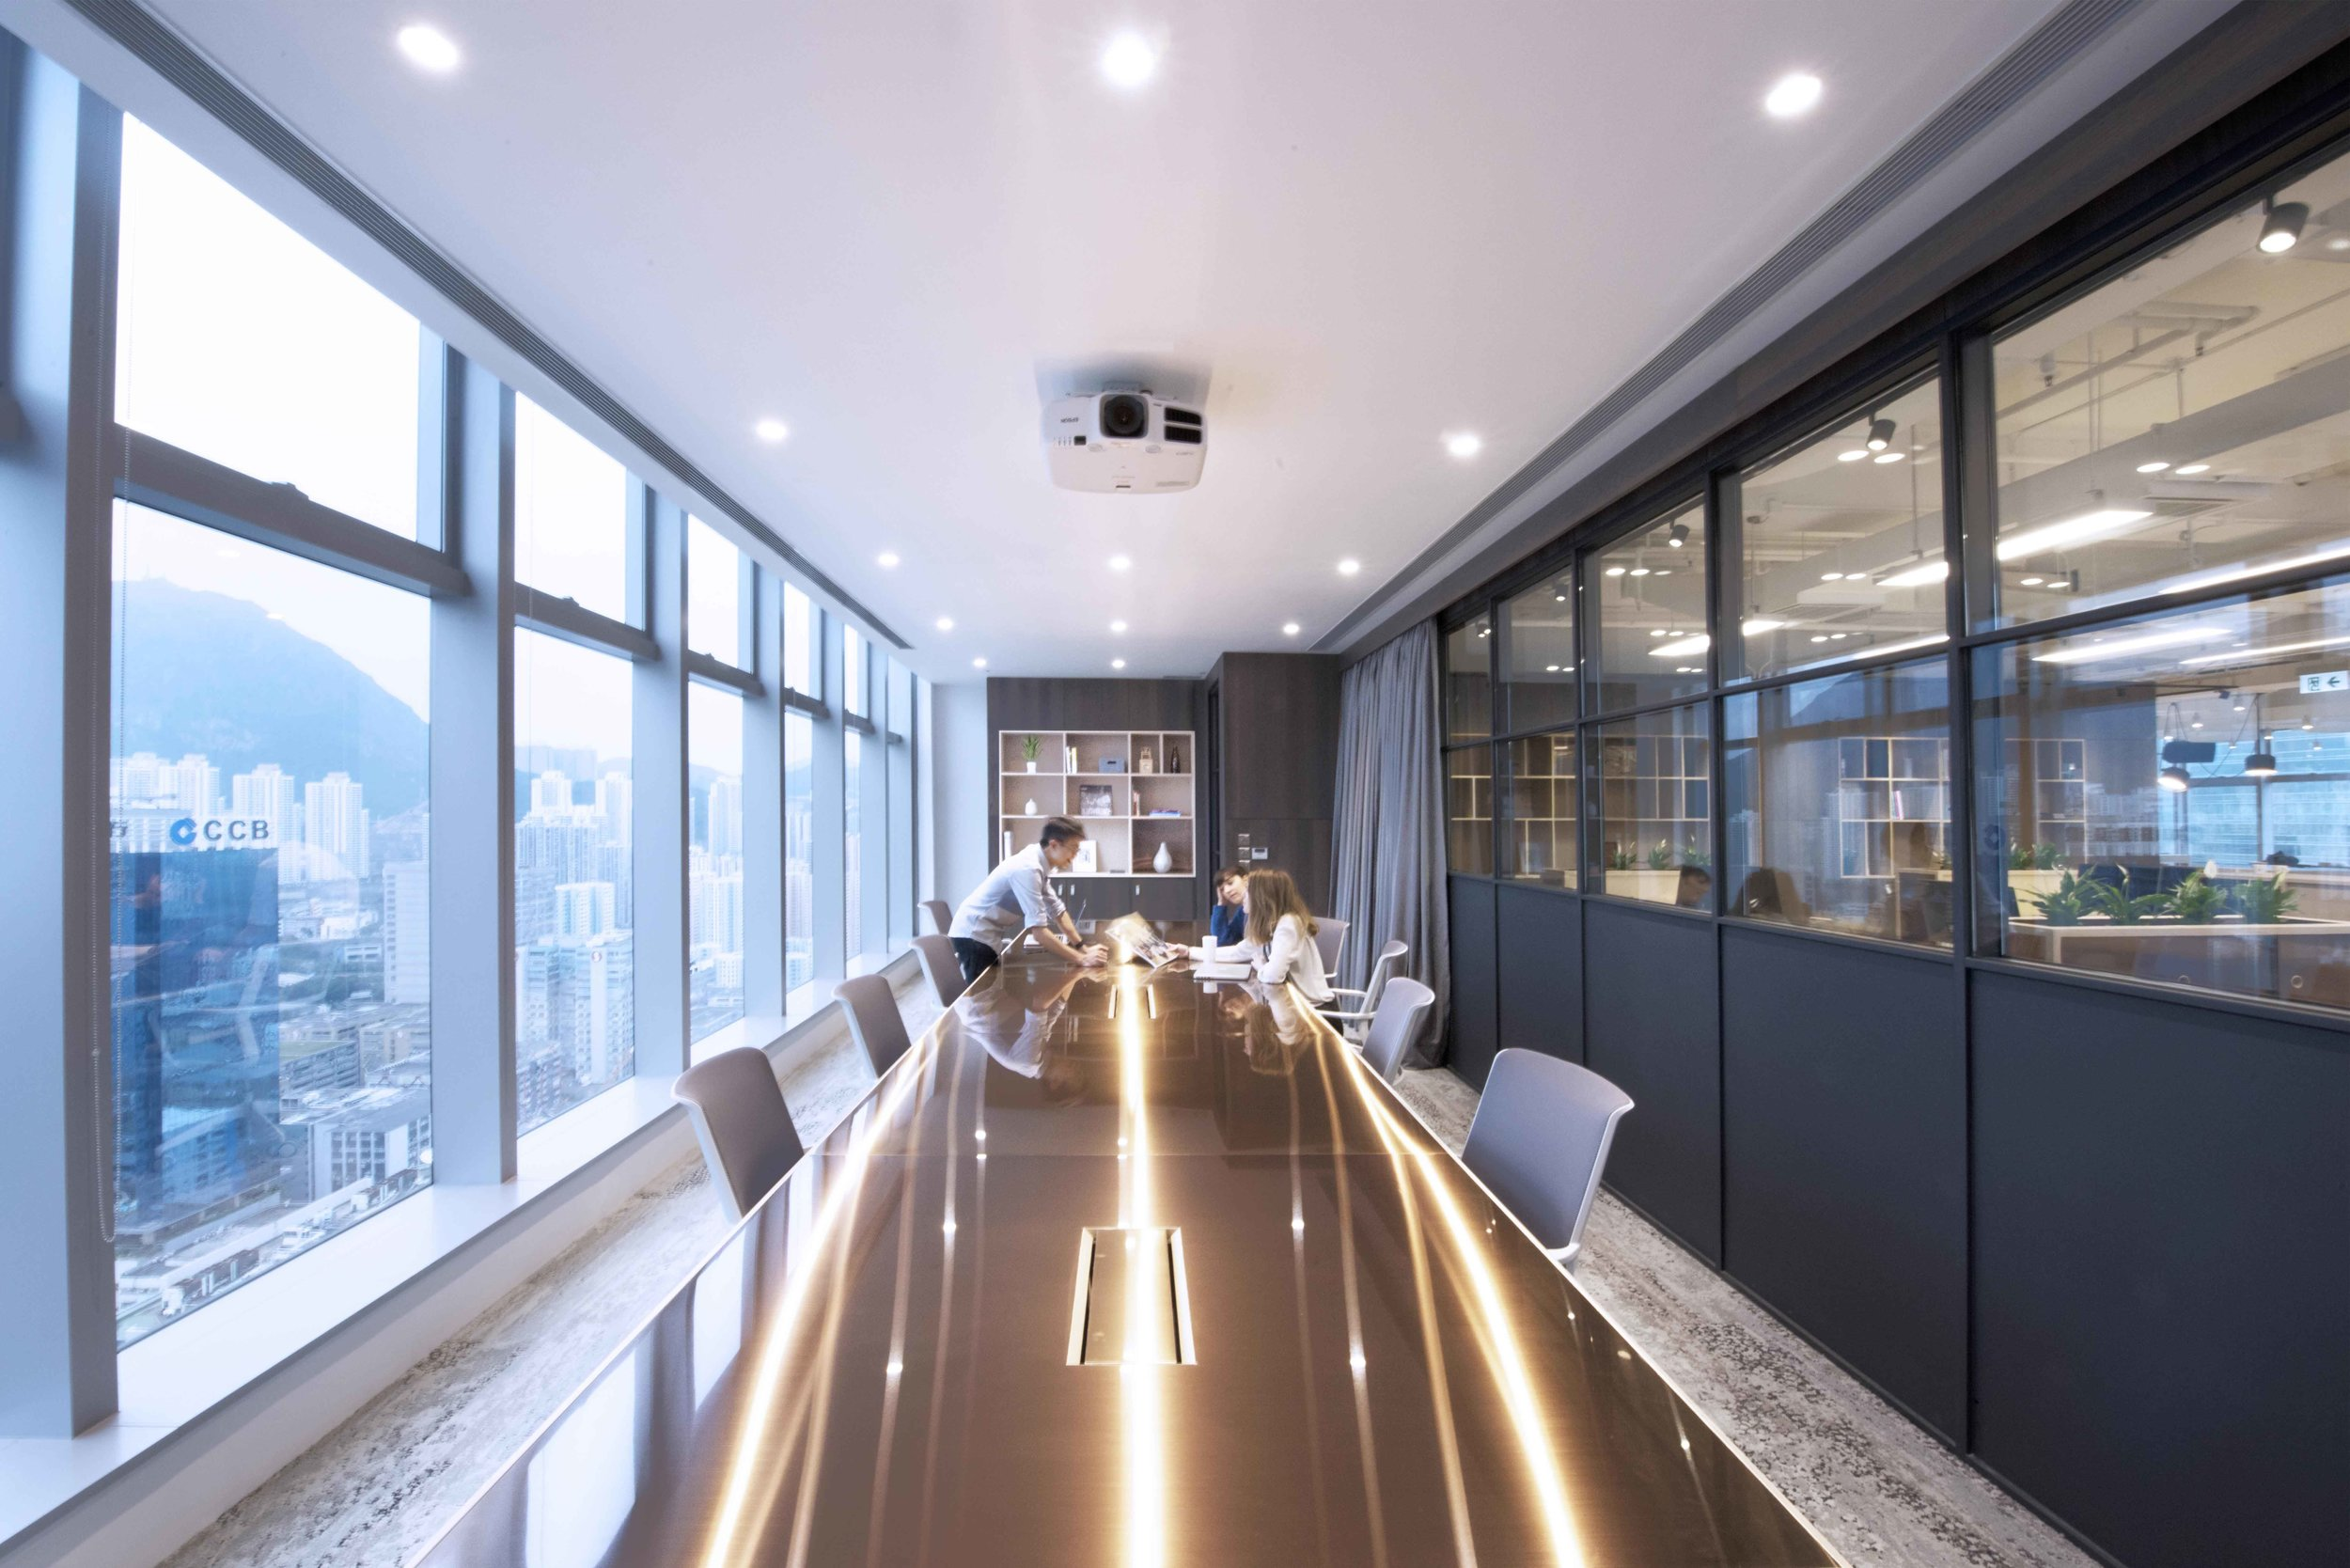 13_Bean Buro_Office Workplace_Kwung Tong_Warner Music Hong Kong.jpg